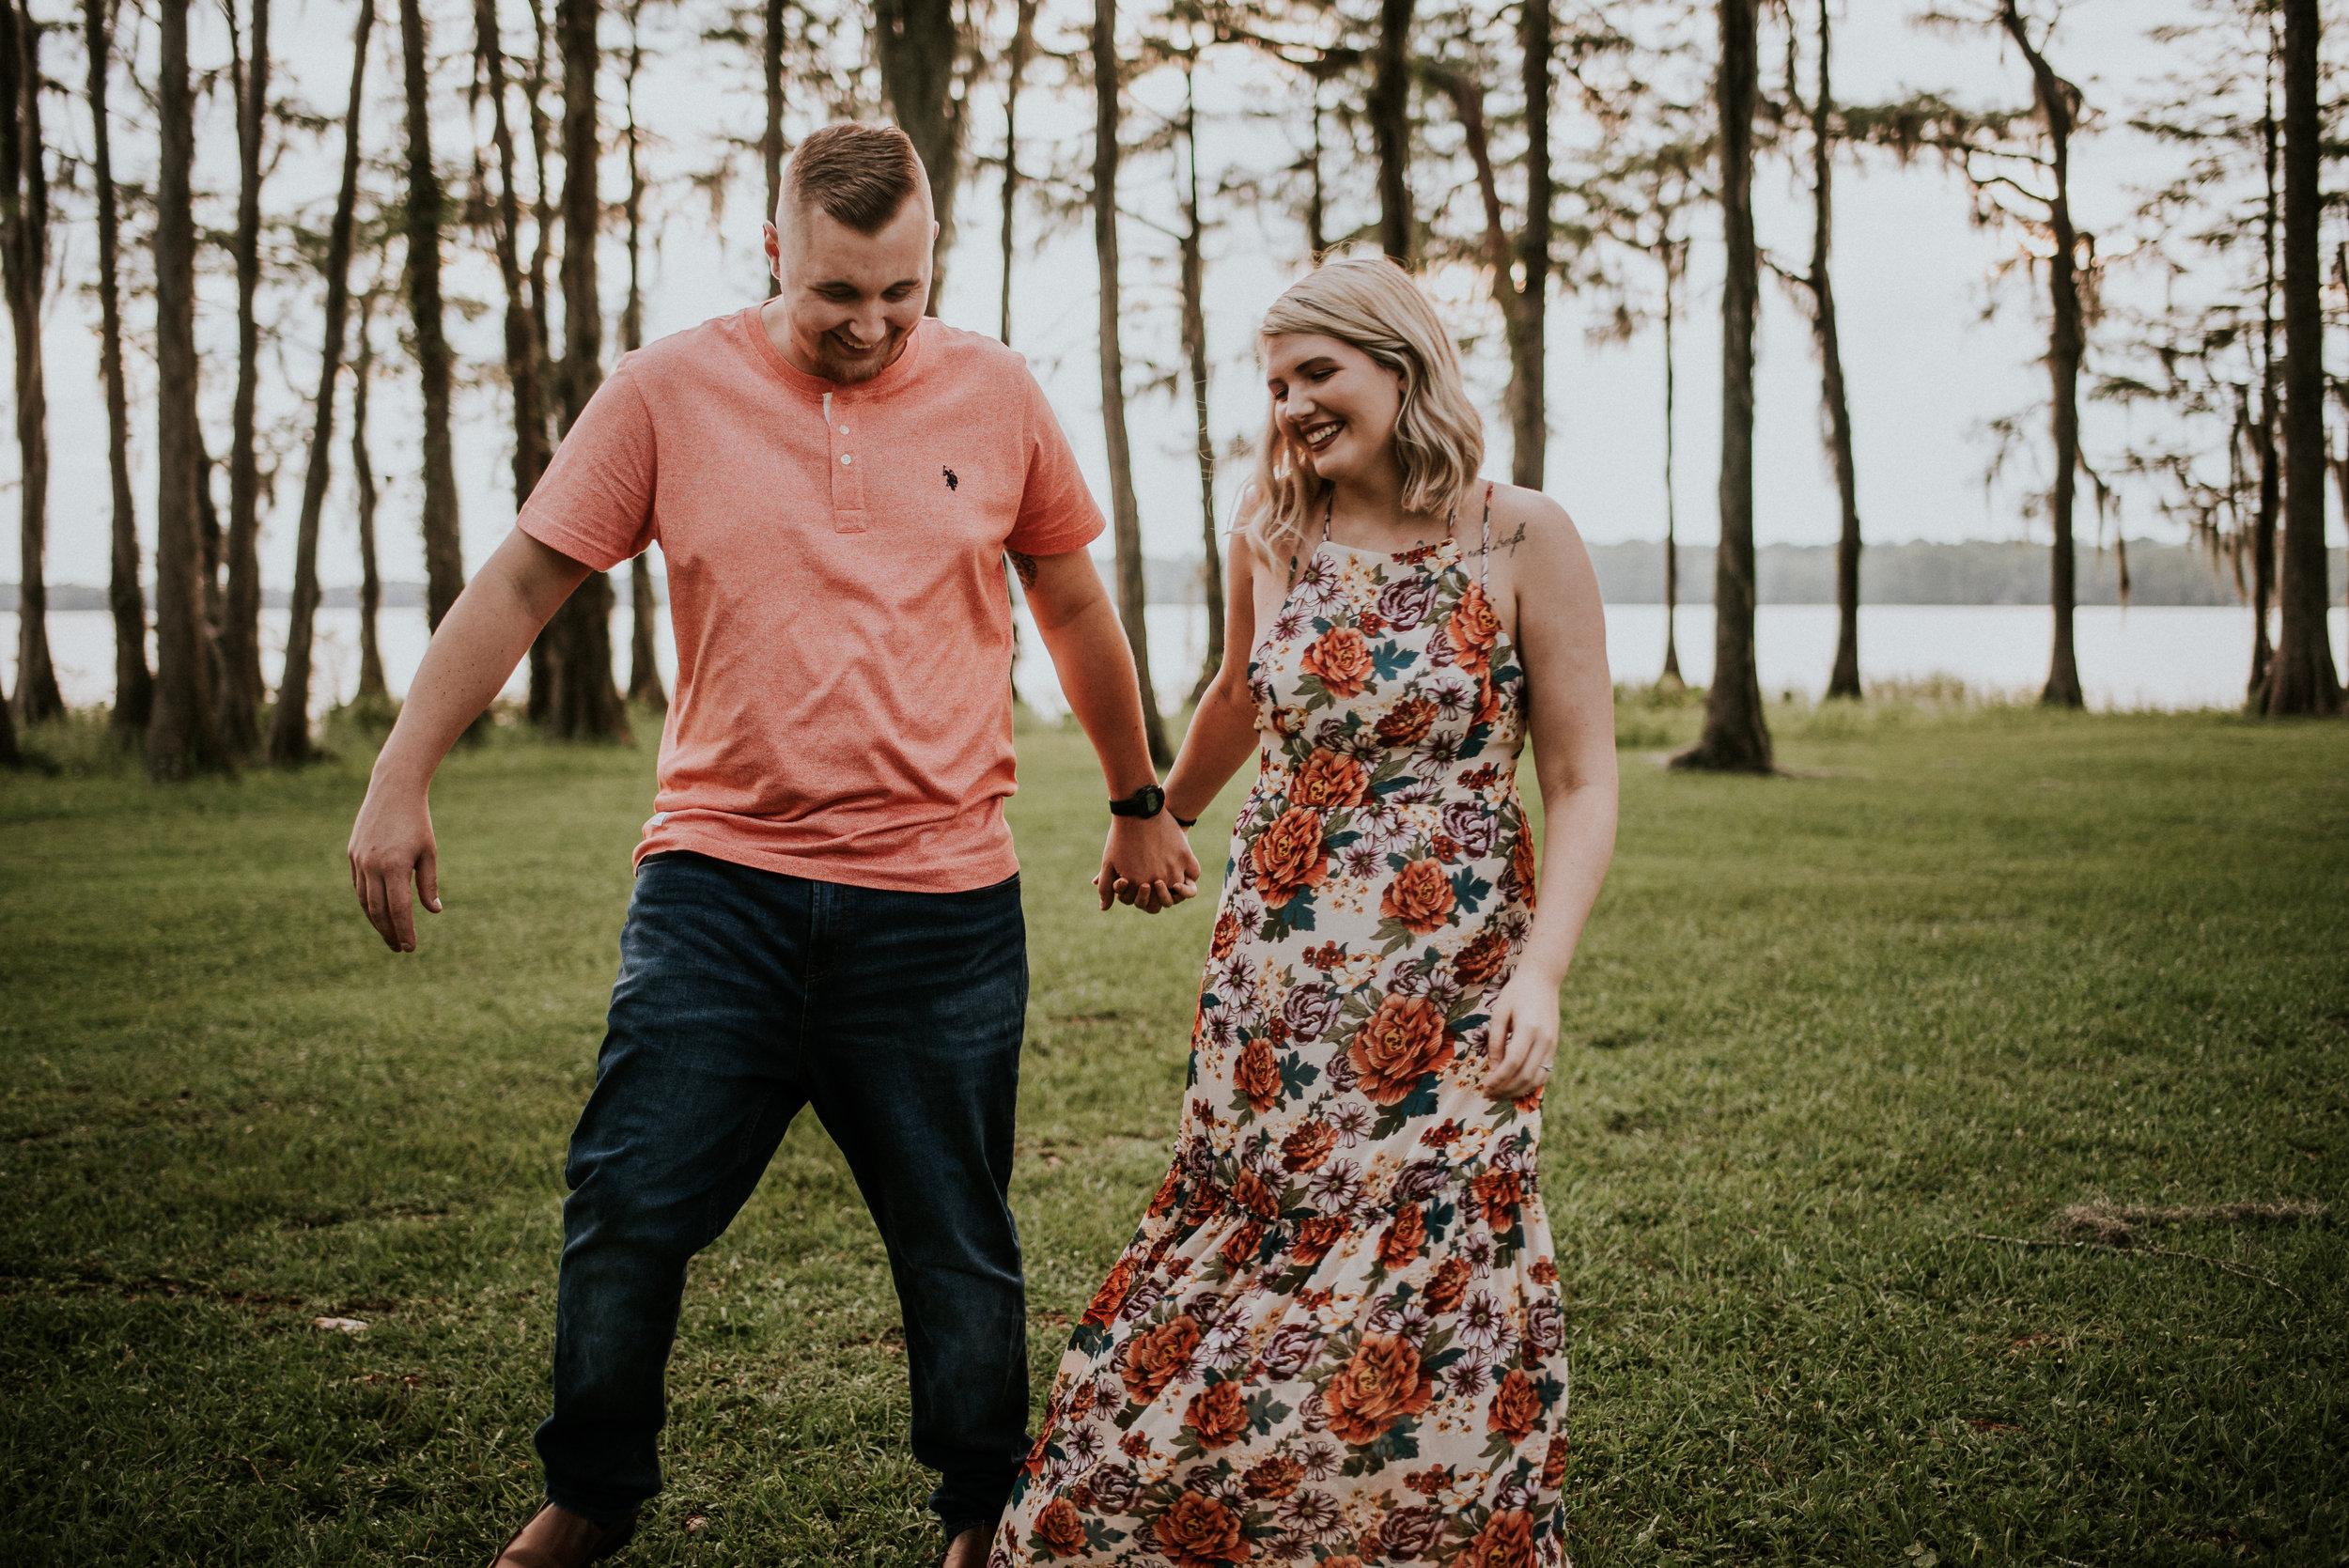 kimberly-trey-crestview-florida-couples-photographer-11.jpg